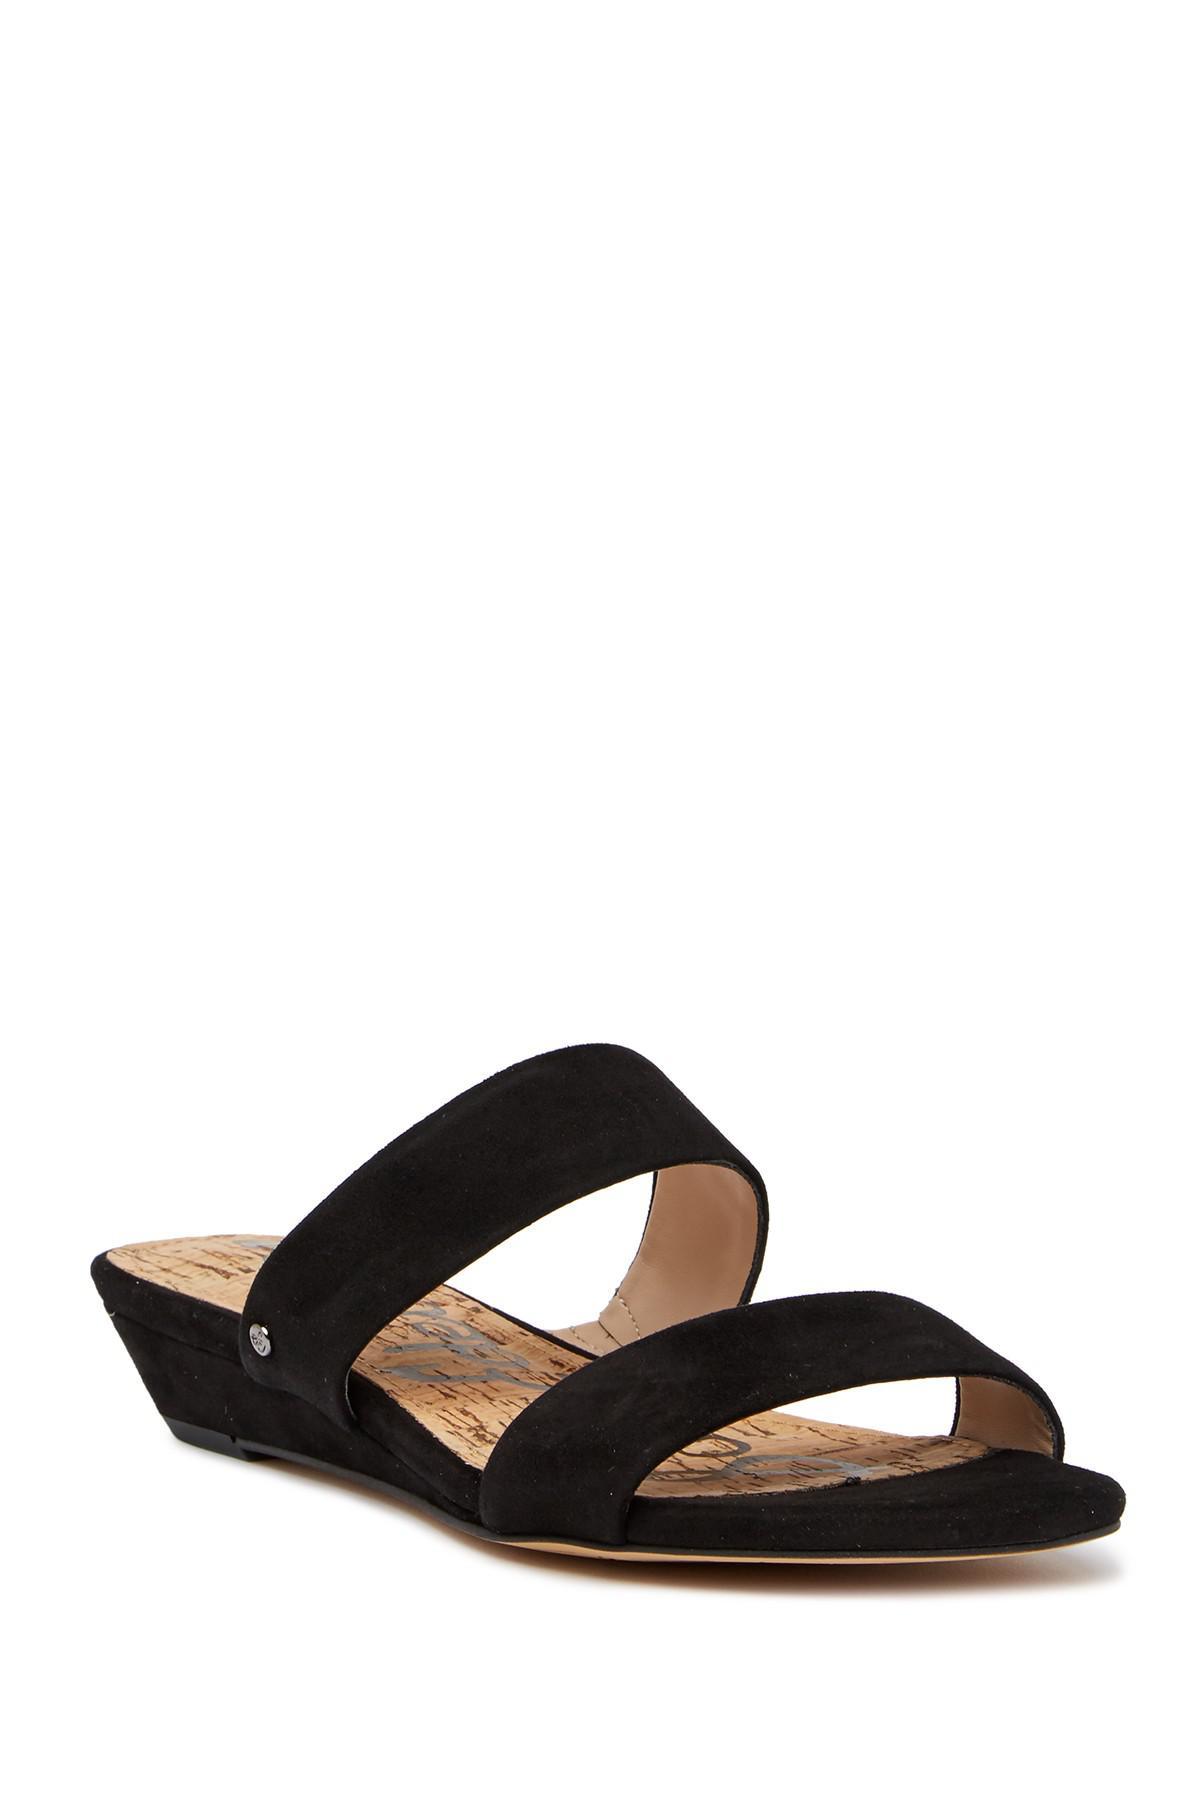 Nubuck Leather Cross Slide Sandals bbvj2